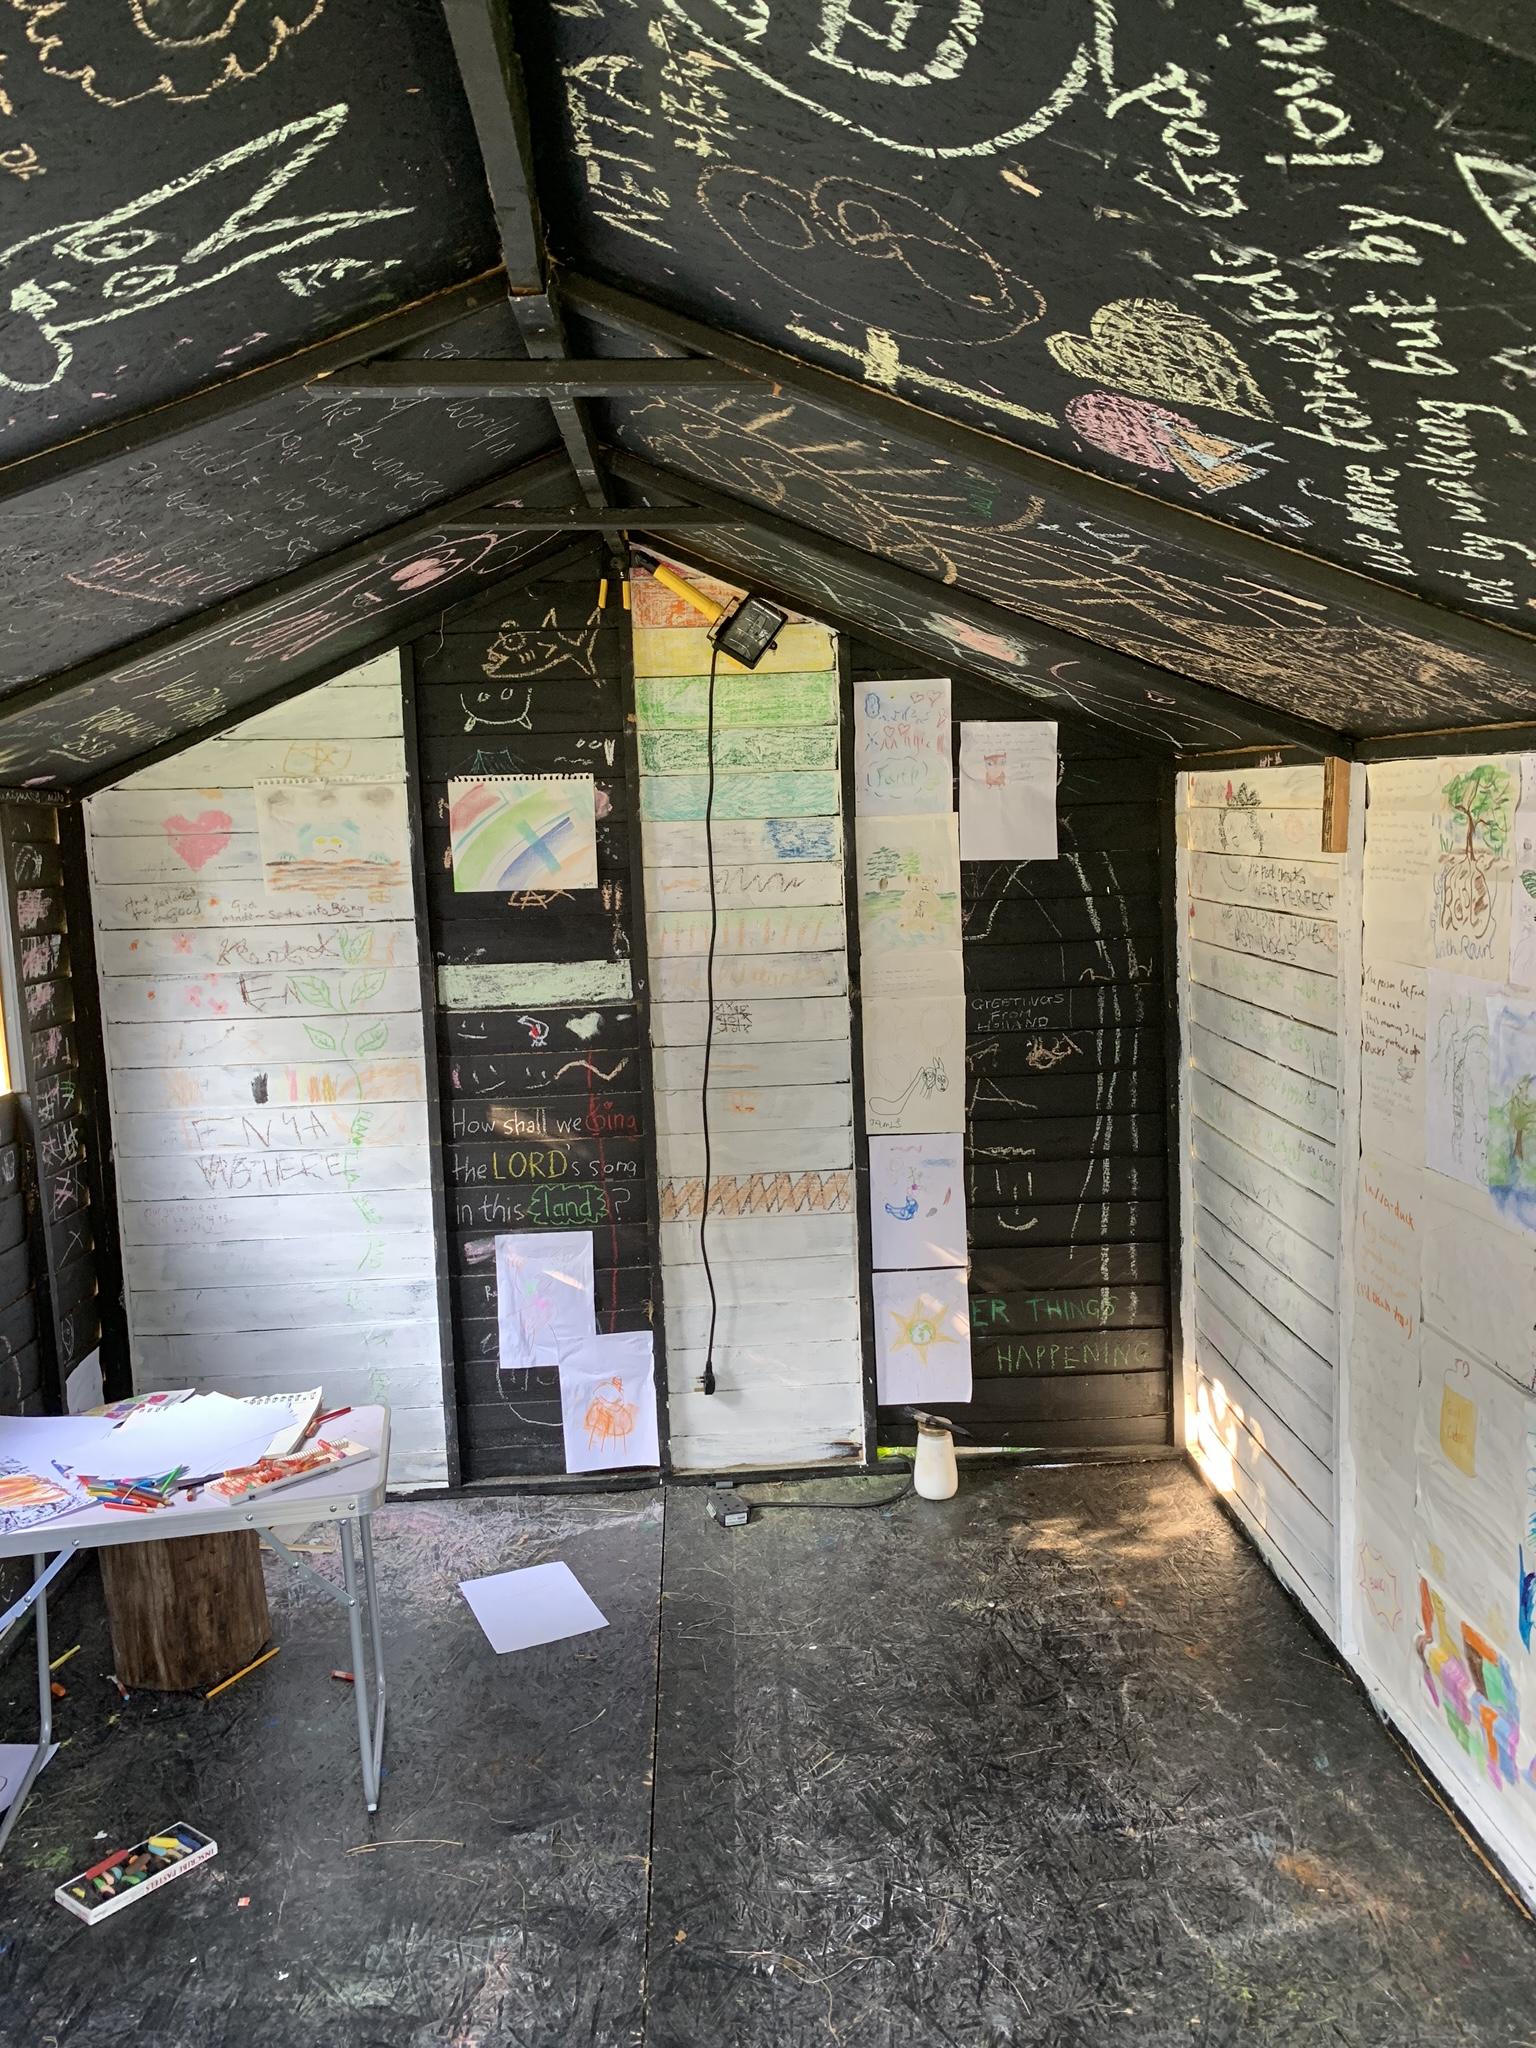 Art shed at Greenbelt 2019